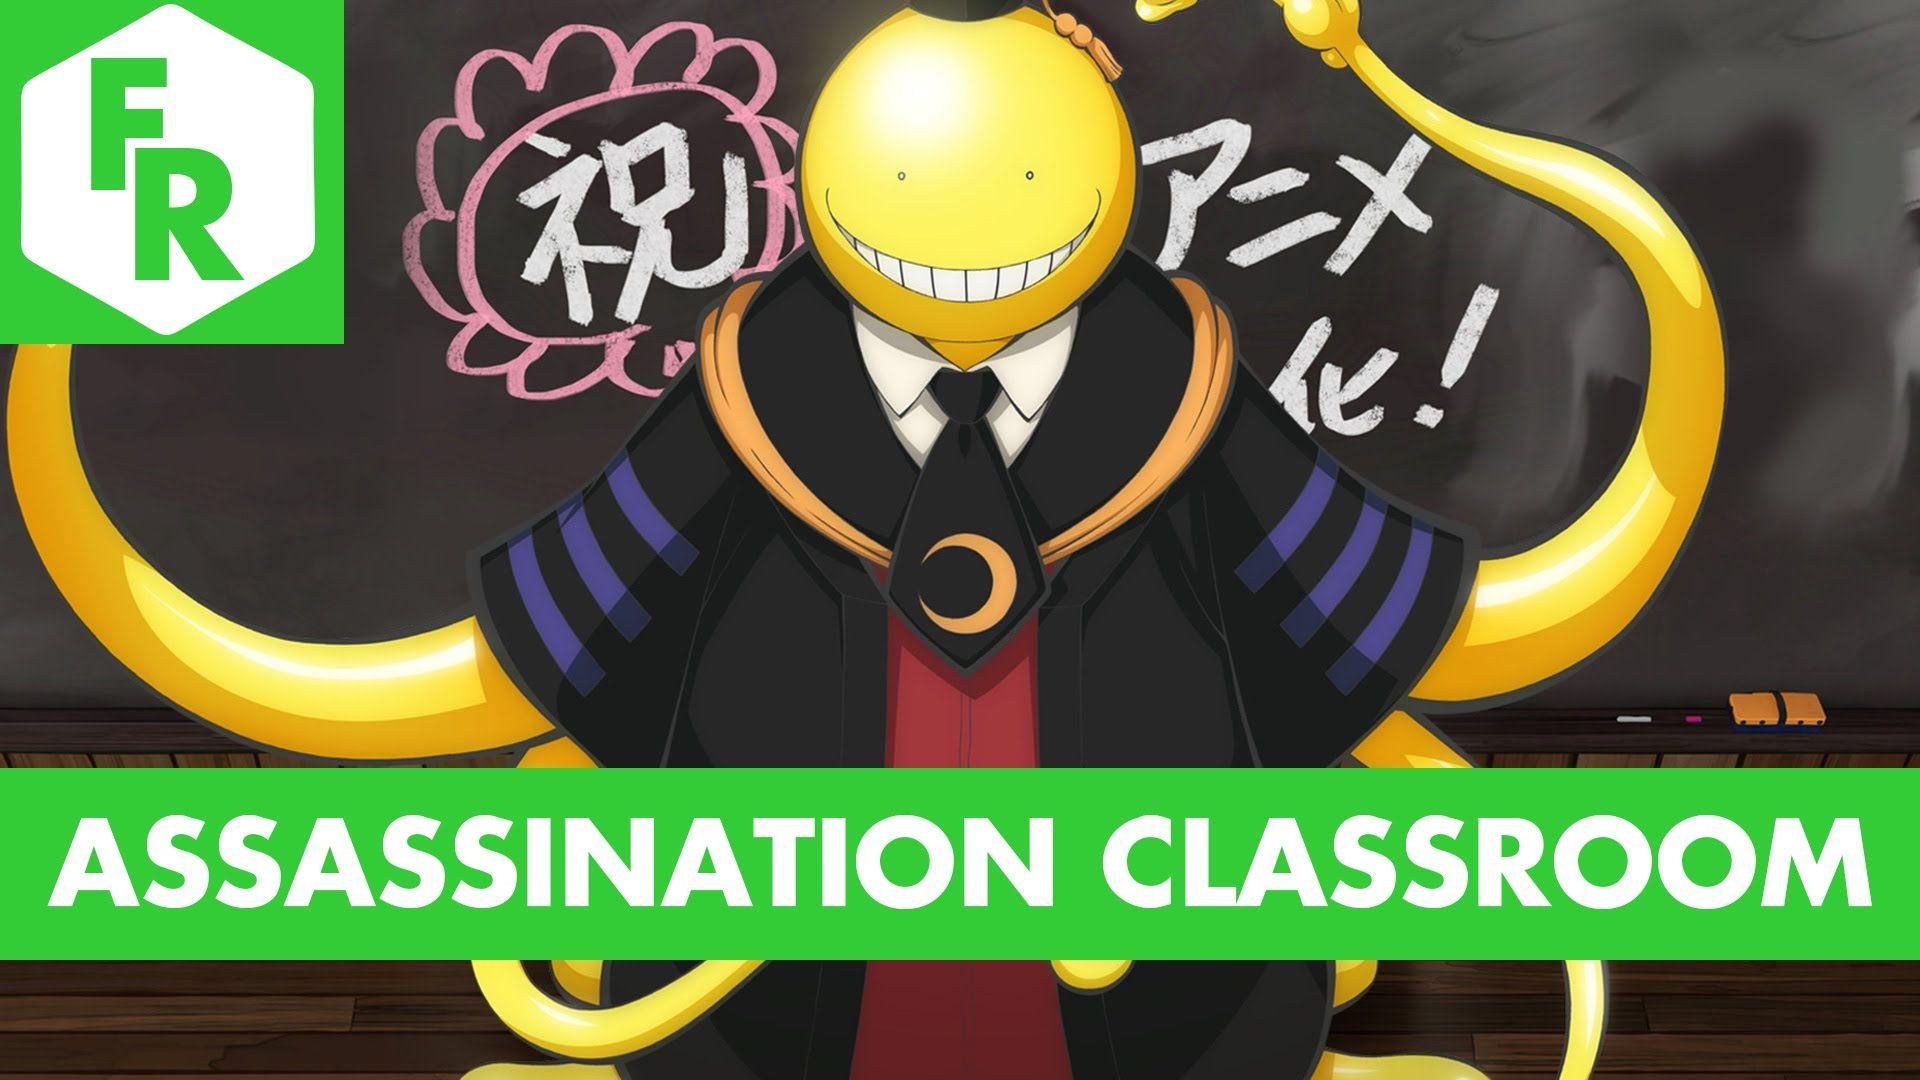 First Reaction Assassination Classroom Ep 0103